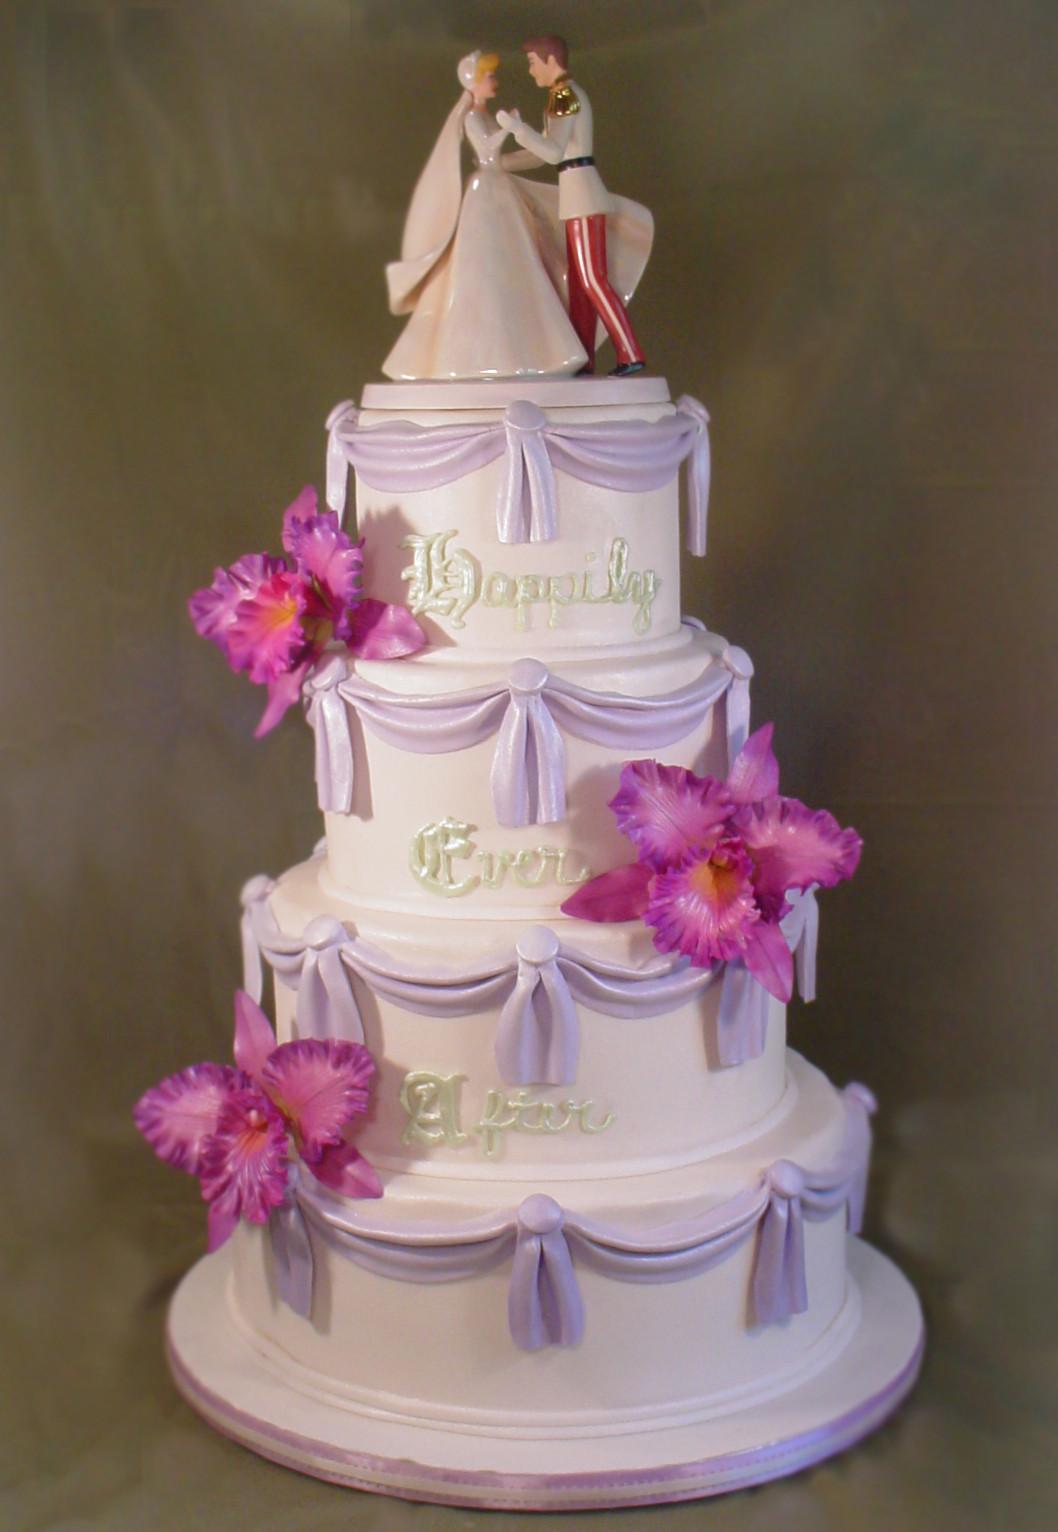 Princess Wedding Cakes  Let them eat cake